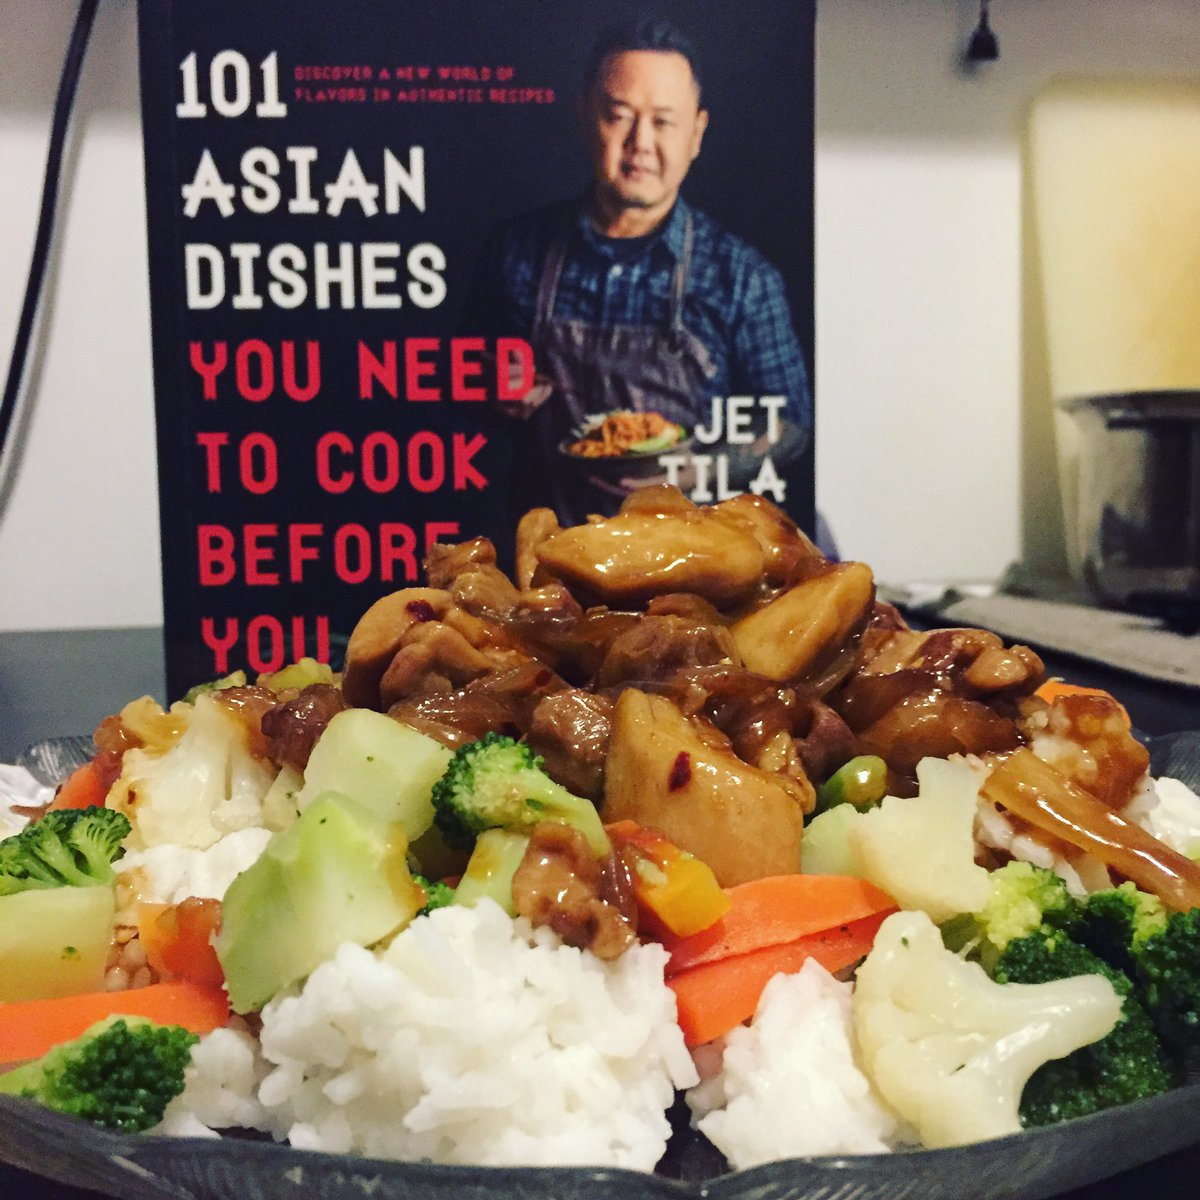 Homemade orange chicken (sautéed) with veggies and rice. Thanks @jettila #101asiandishes <br>http://pic.twitter.com/DWcJfPLNHf